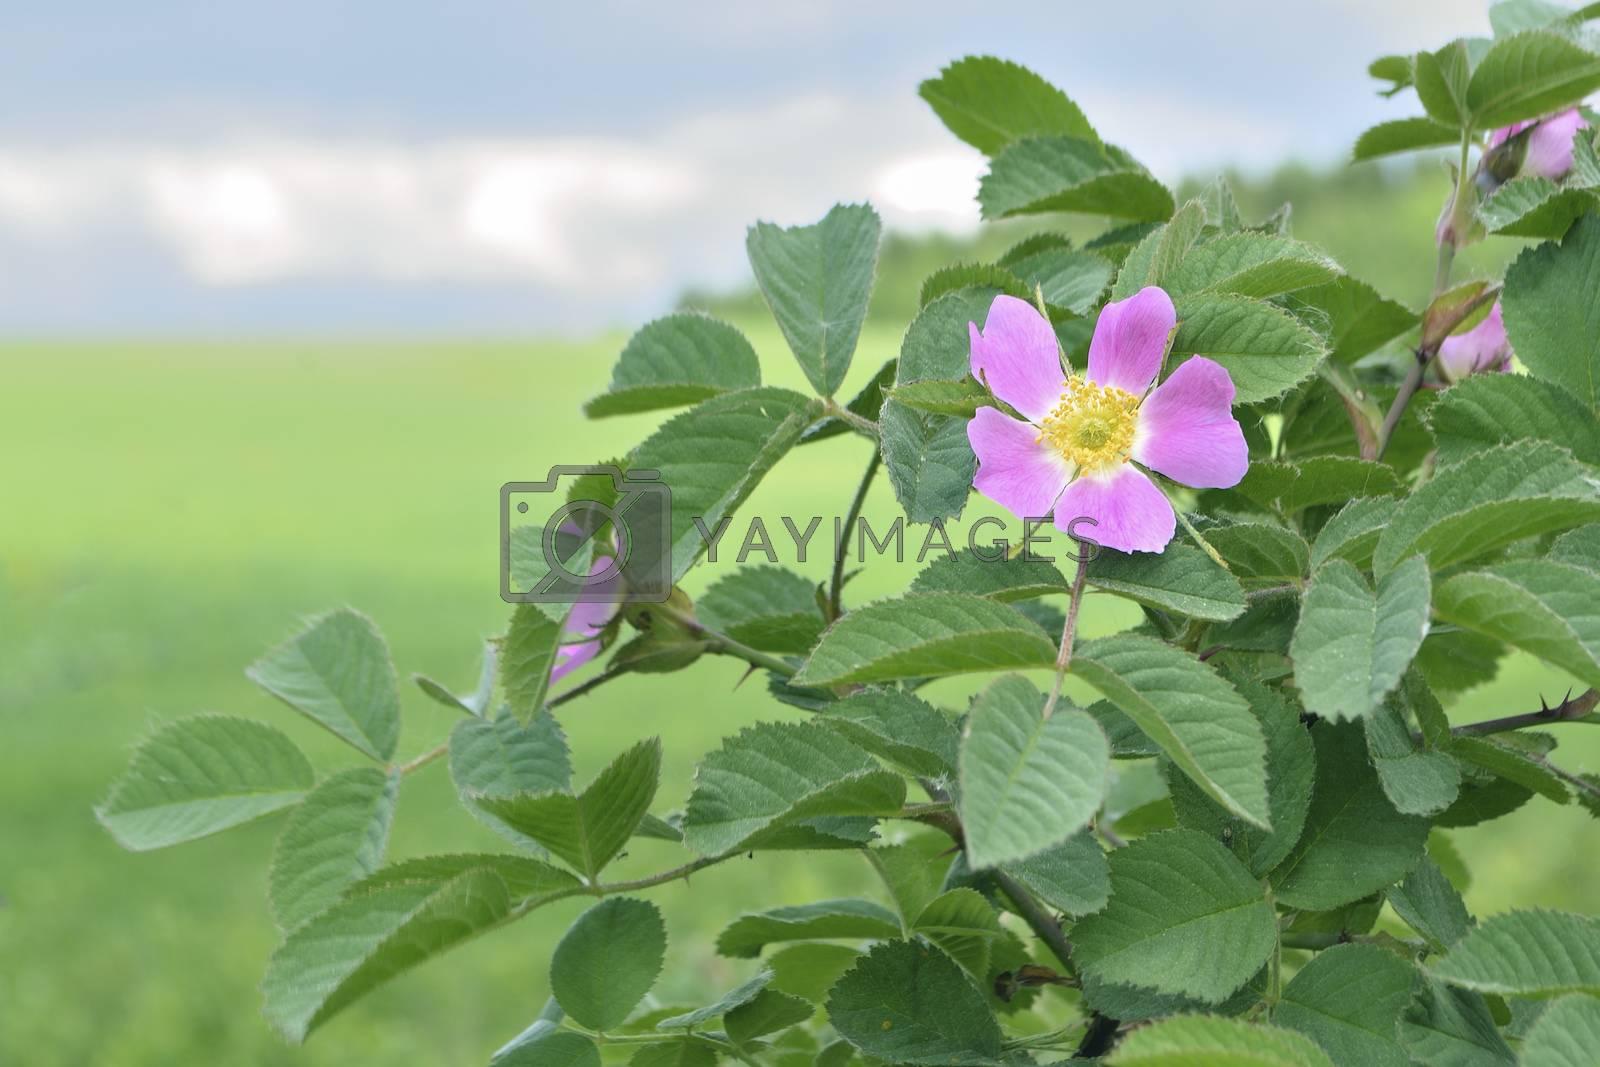 prickly wild rose bush with blossom flower; focus on flower